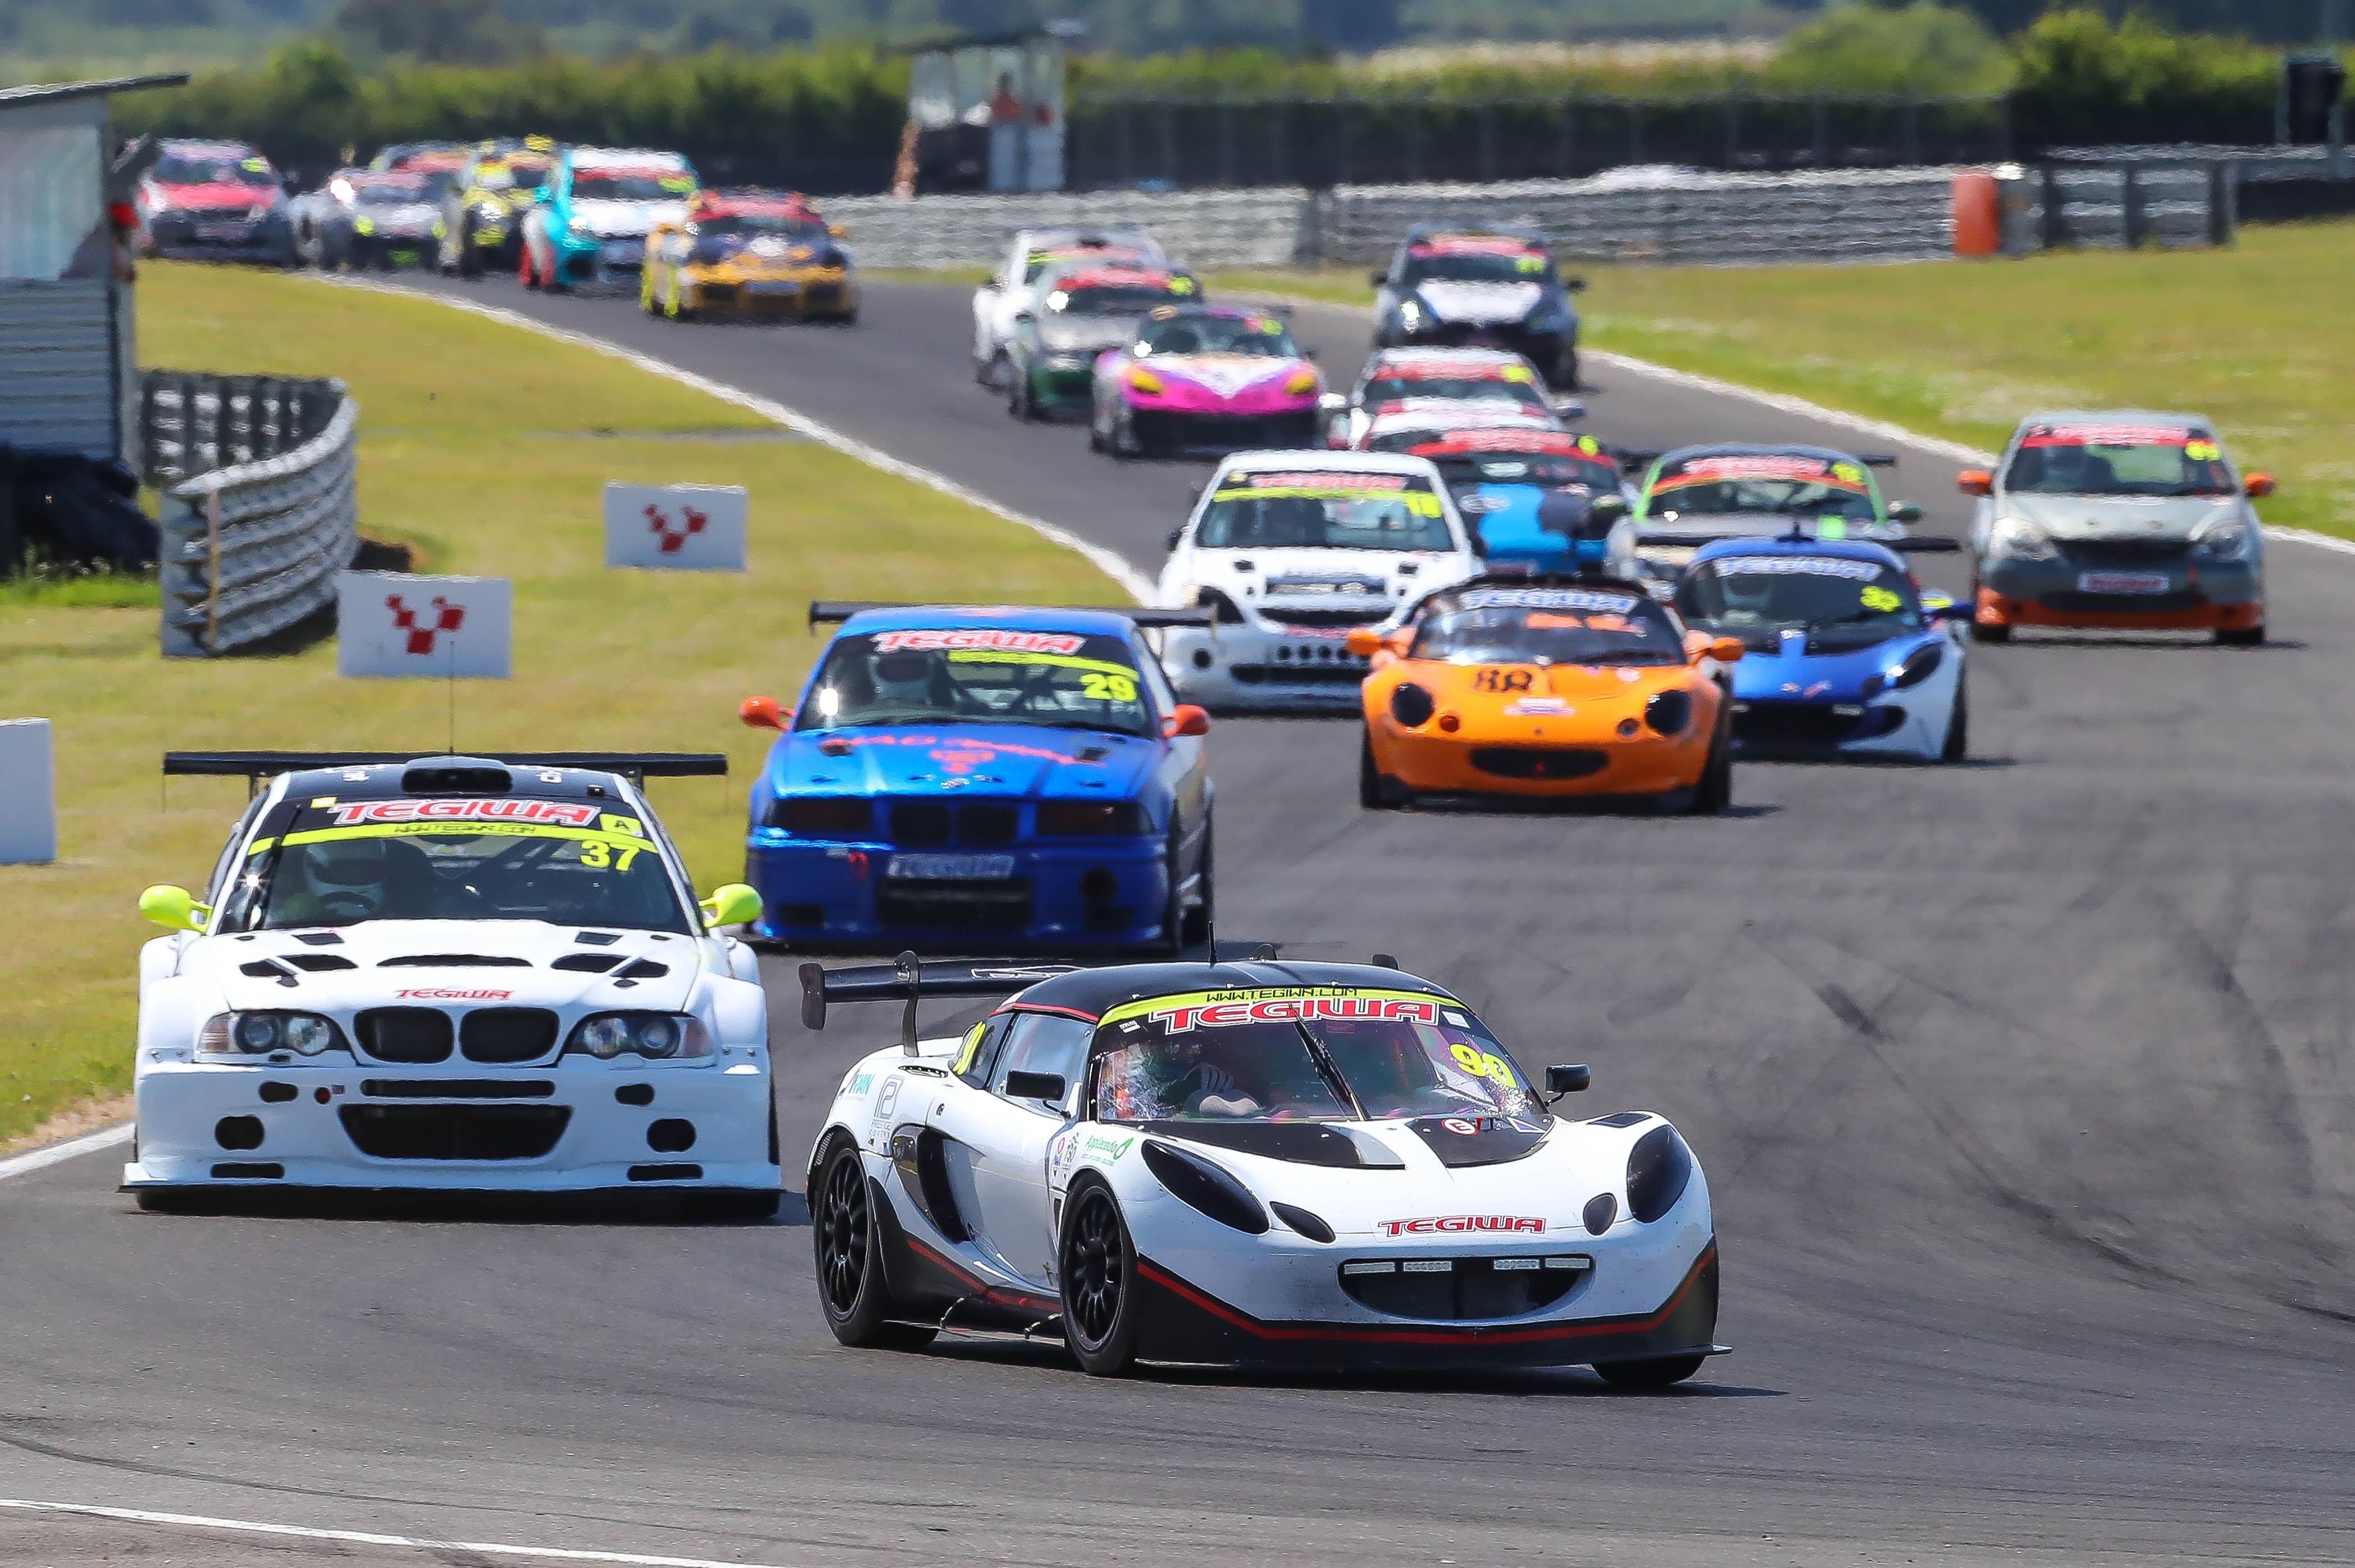 John Munro (Lotuse Elise S2), Roadsports, Snetterton 2021